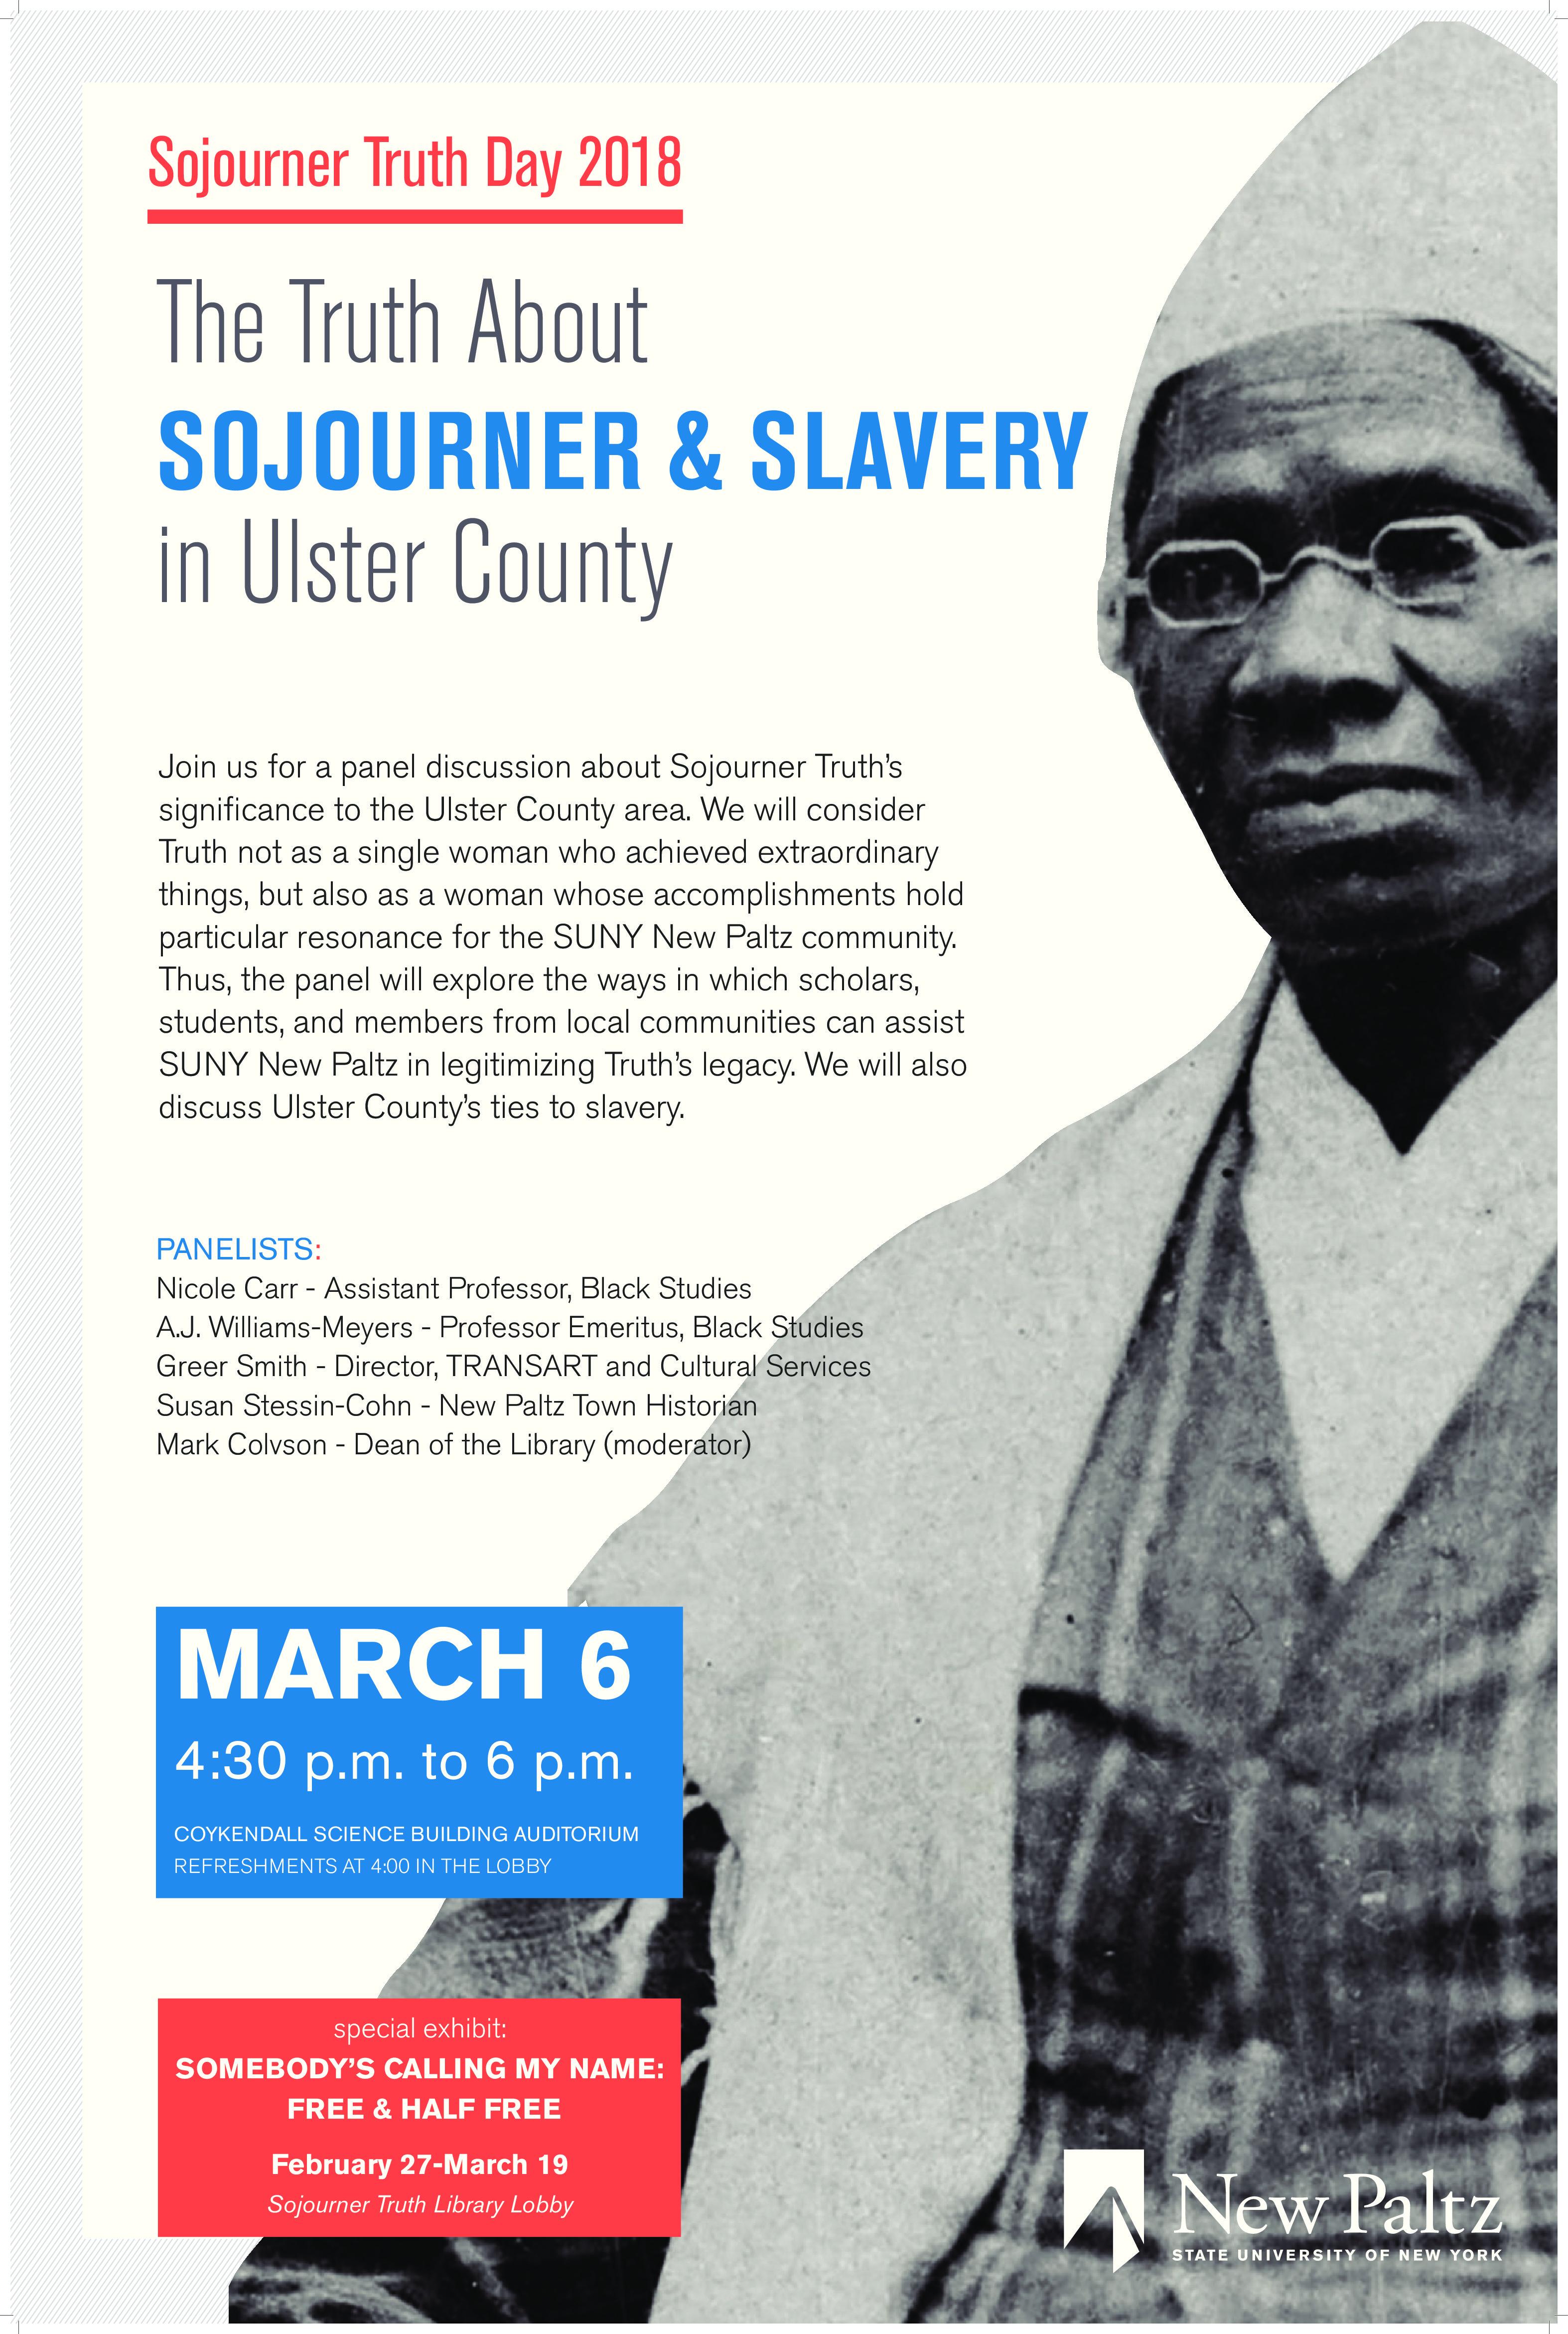 Sojourner Truth Day 2018